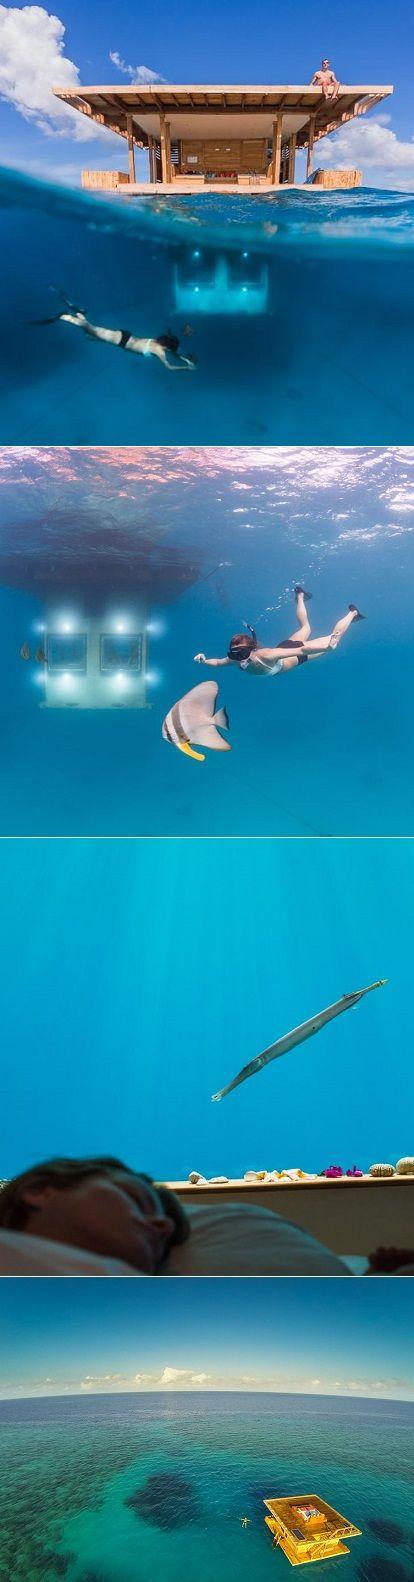 Underwater hotel room at the Manta Resort in the Indian Ocean.